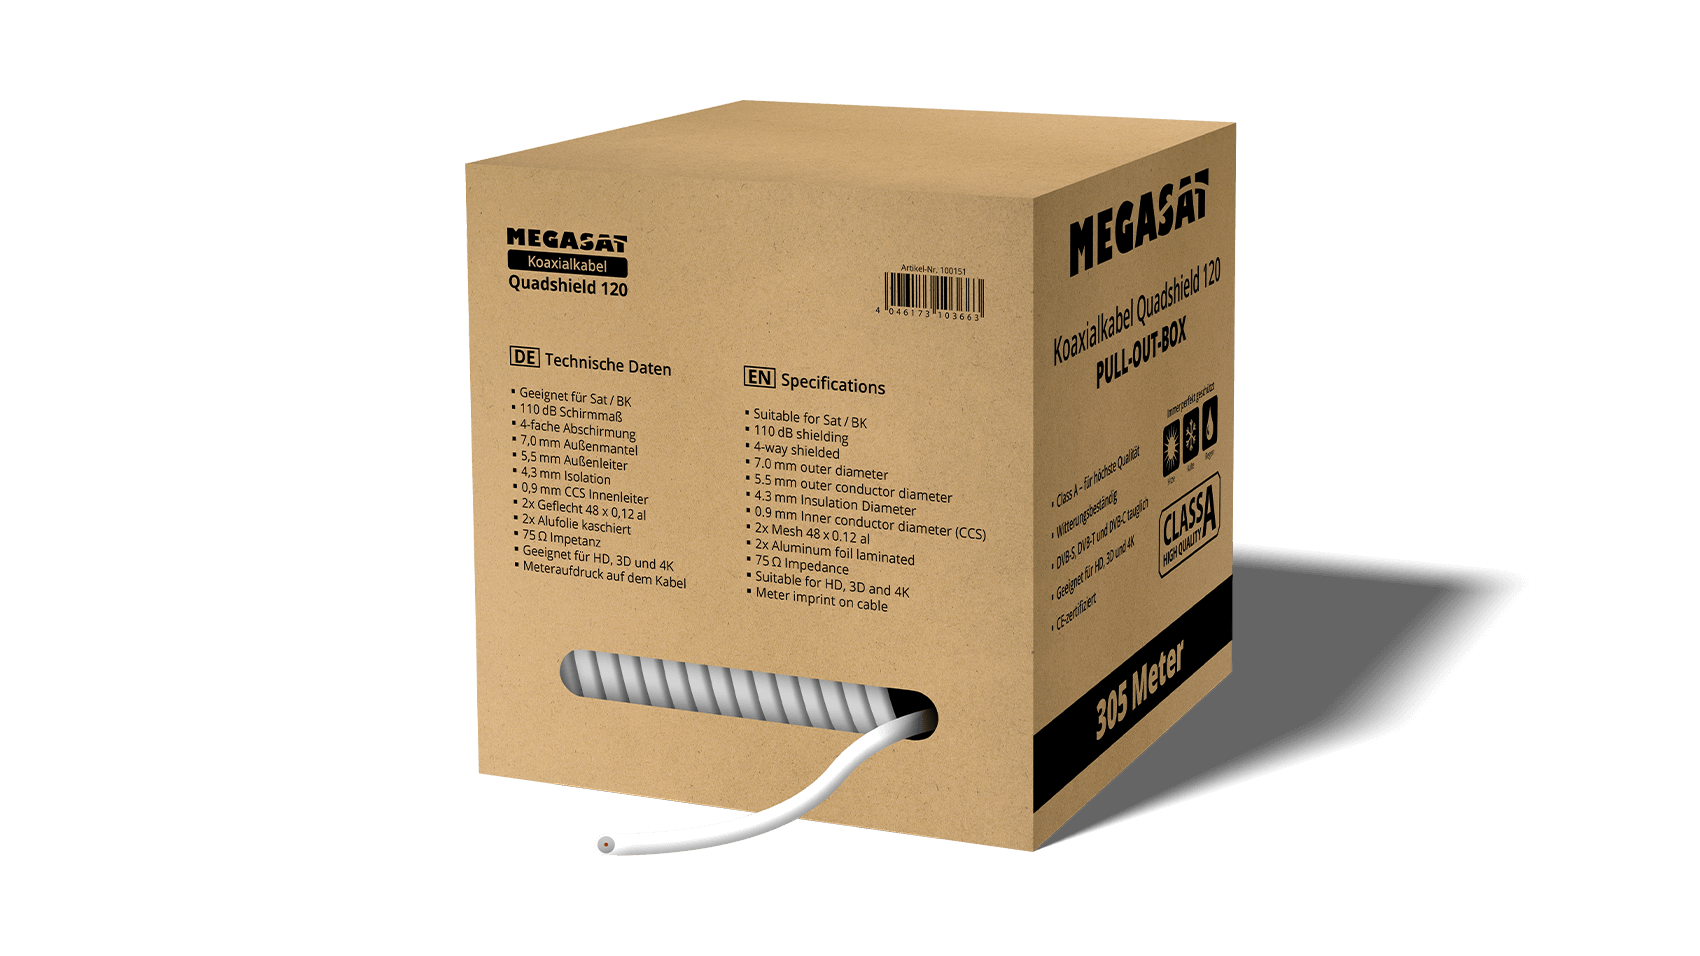 megasat_koaxialkabel_quadshield_120_305m_pull_out_box